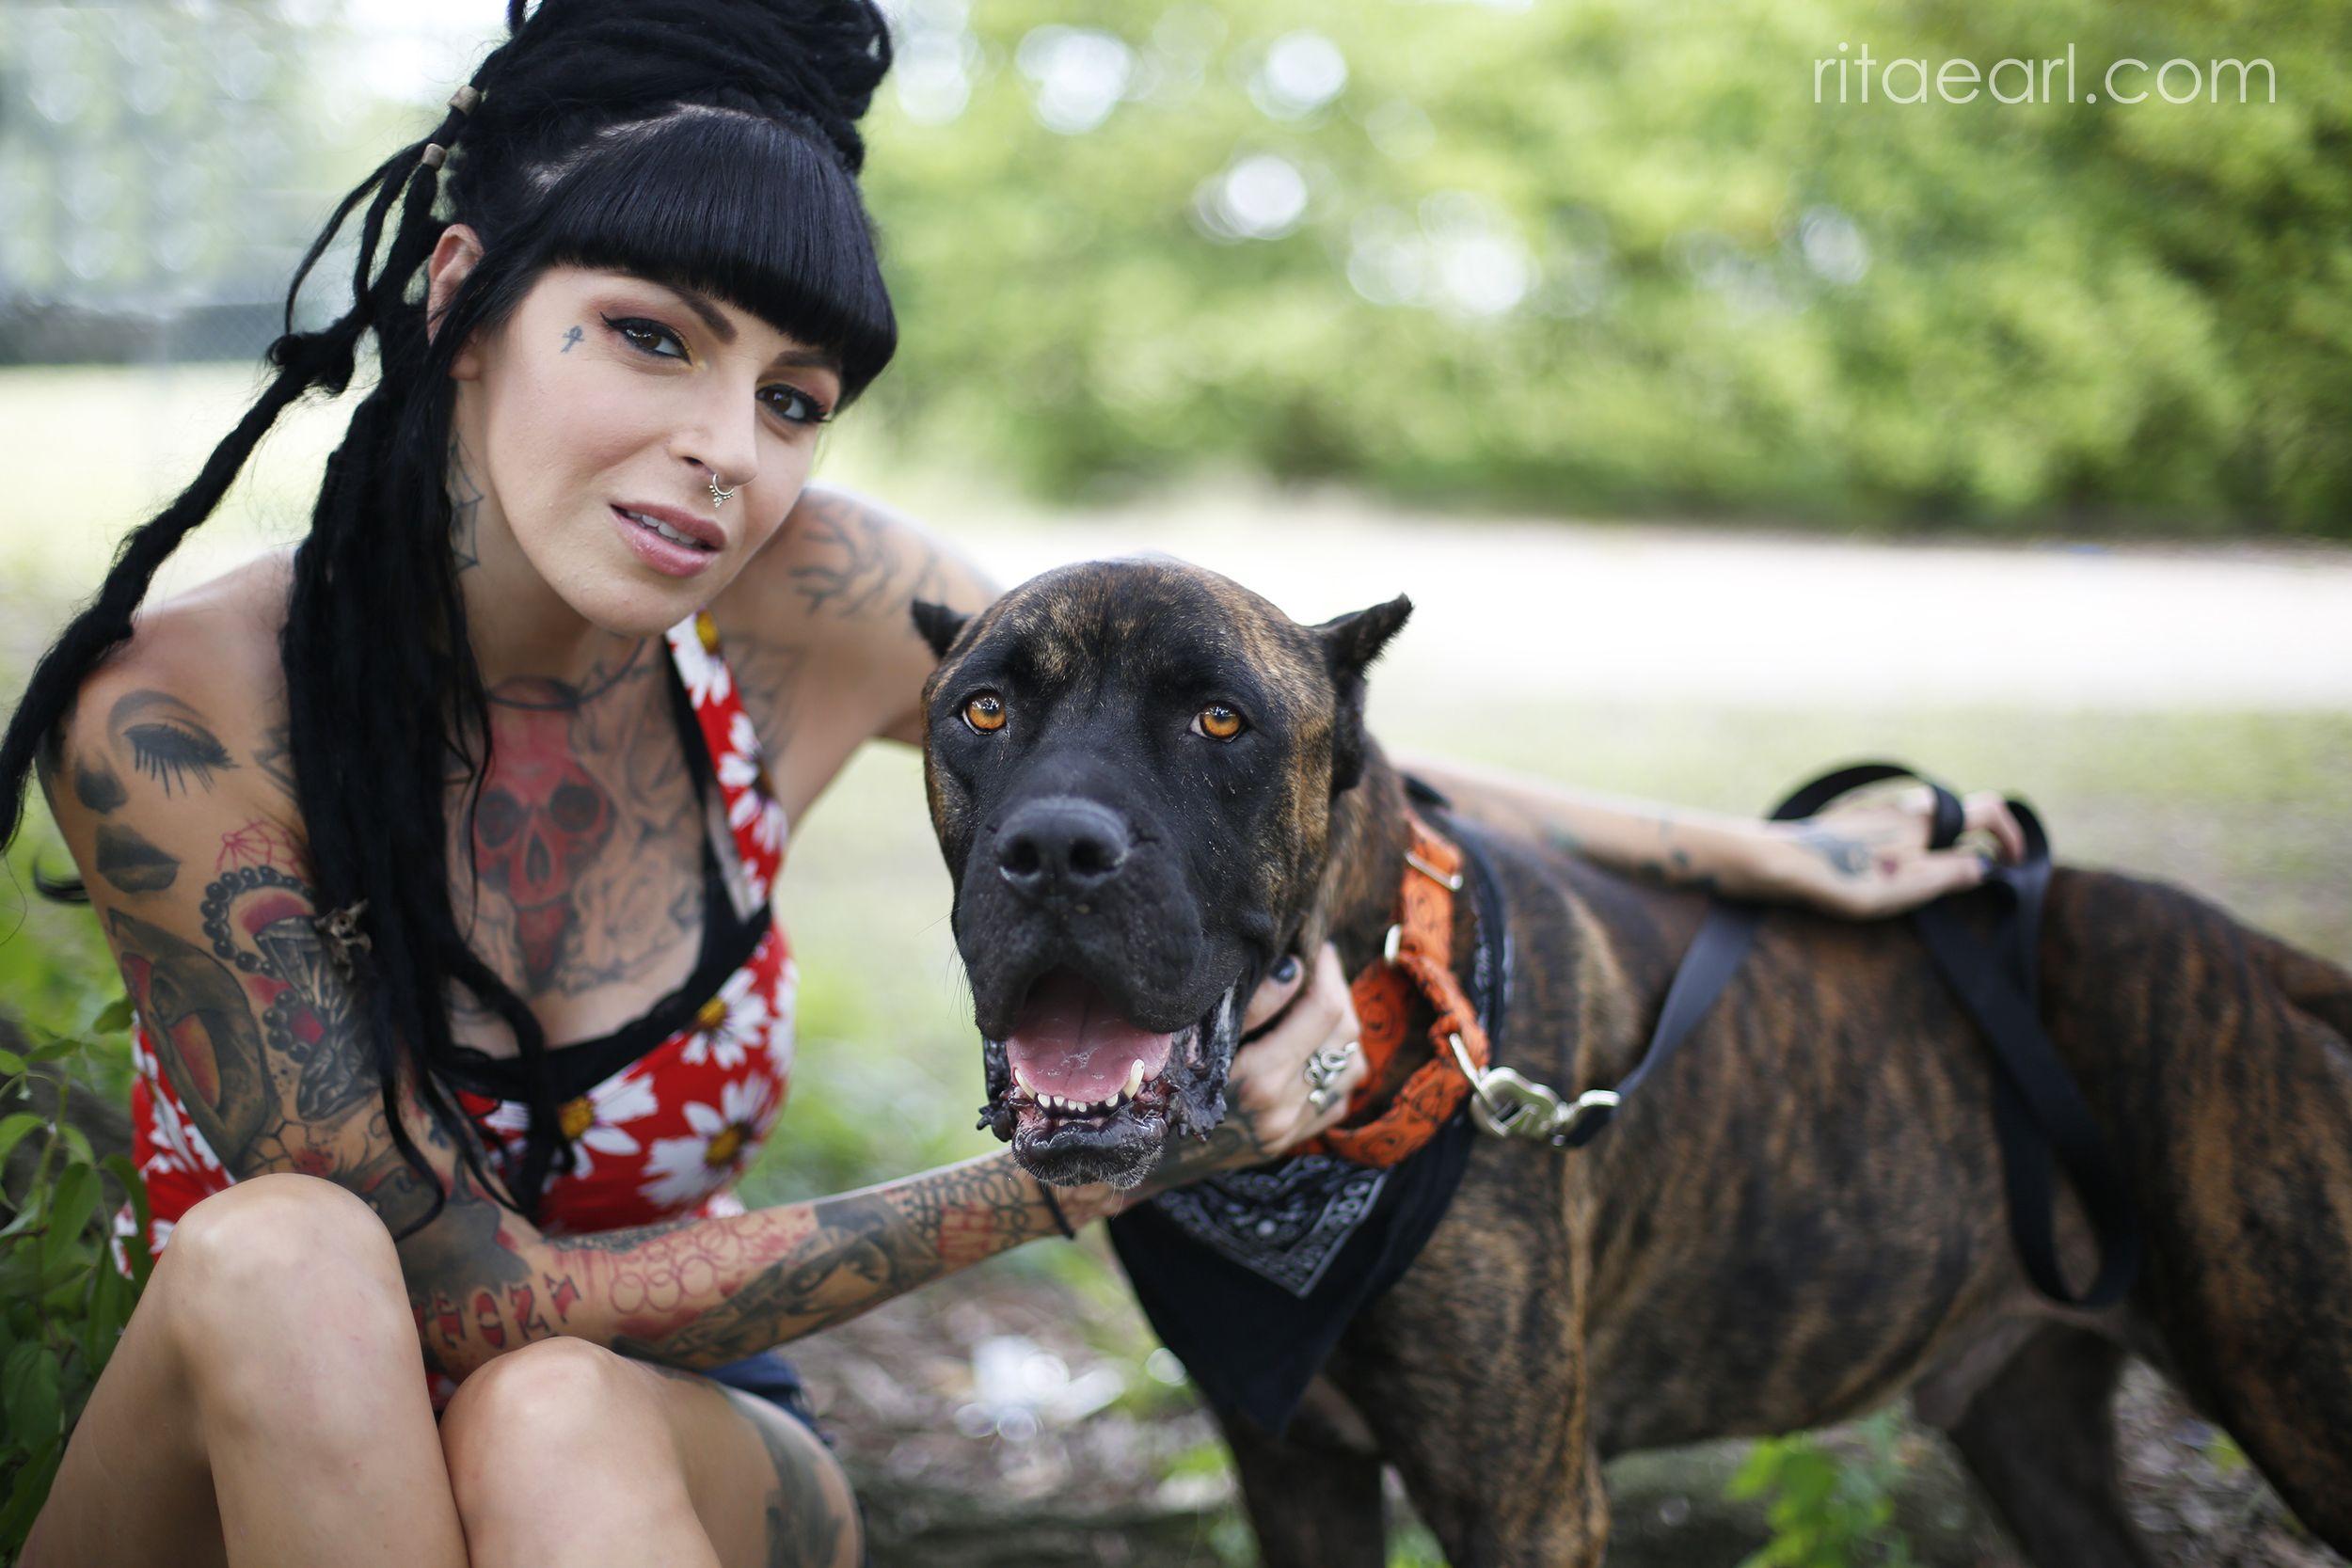 Rita Earl Photography Villalobos Rescue Center Pit Bulls Parolees Pit Bulls